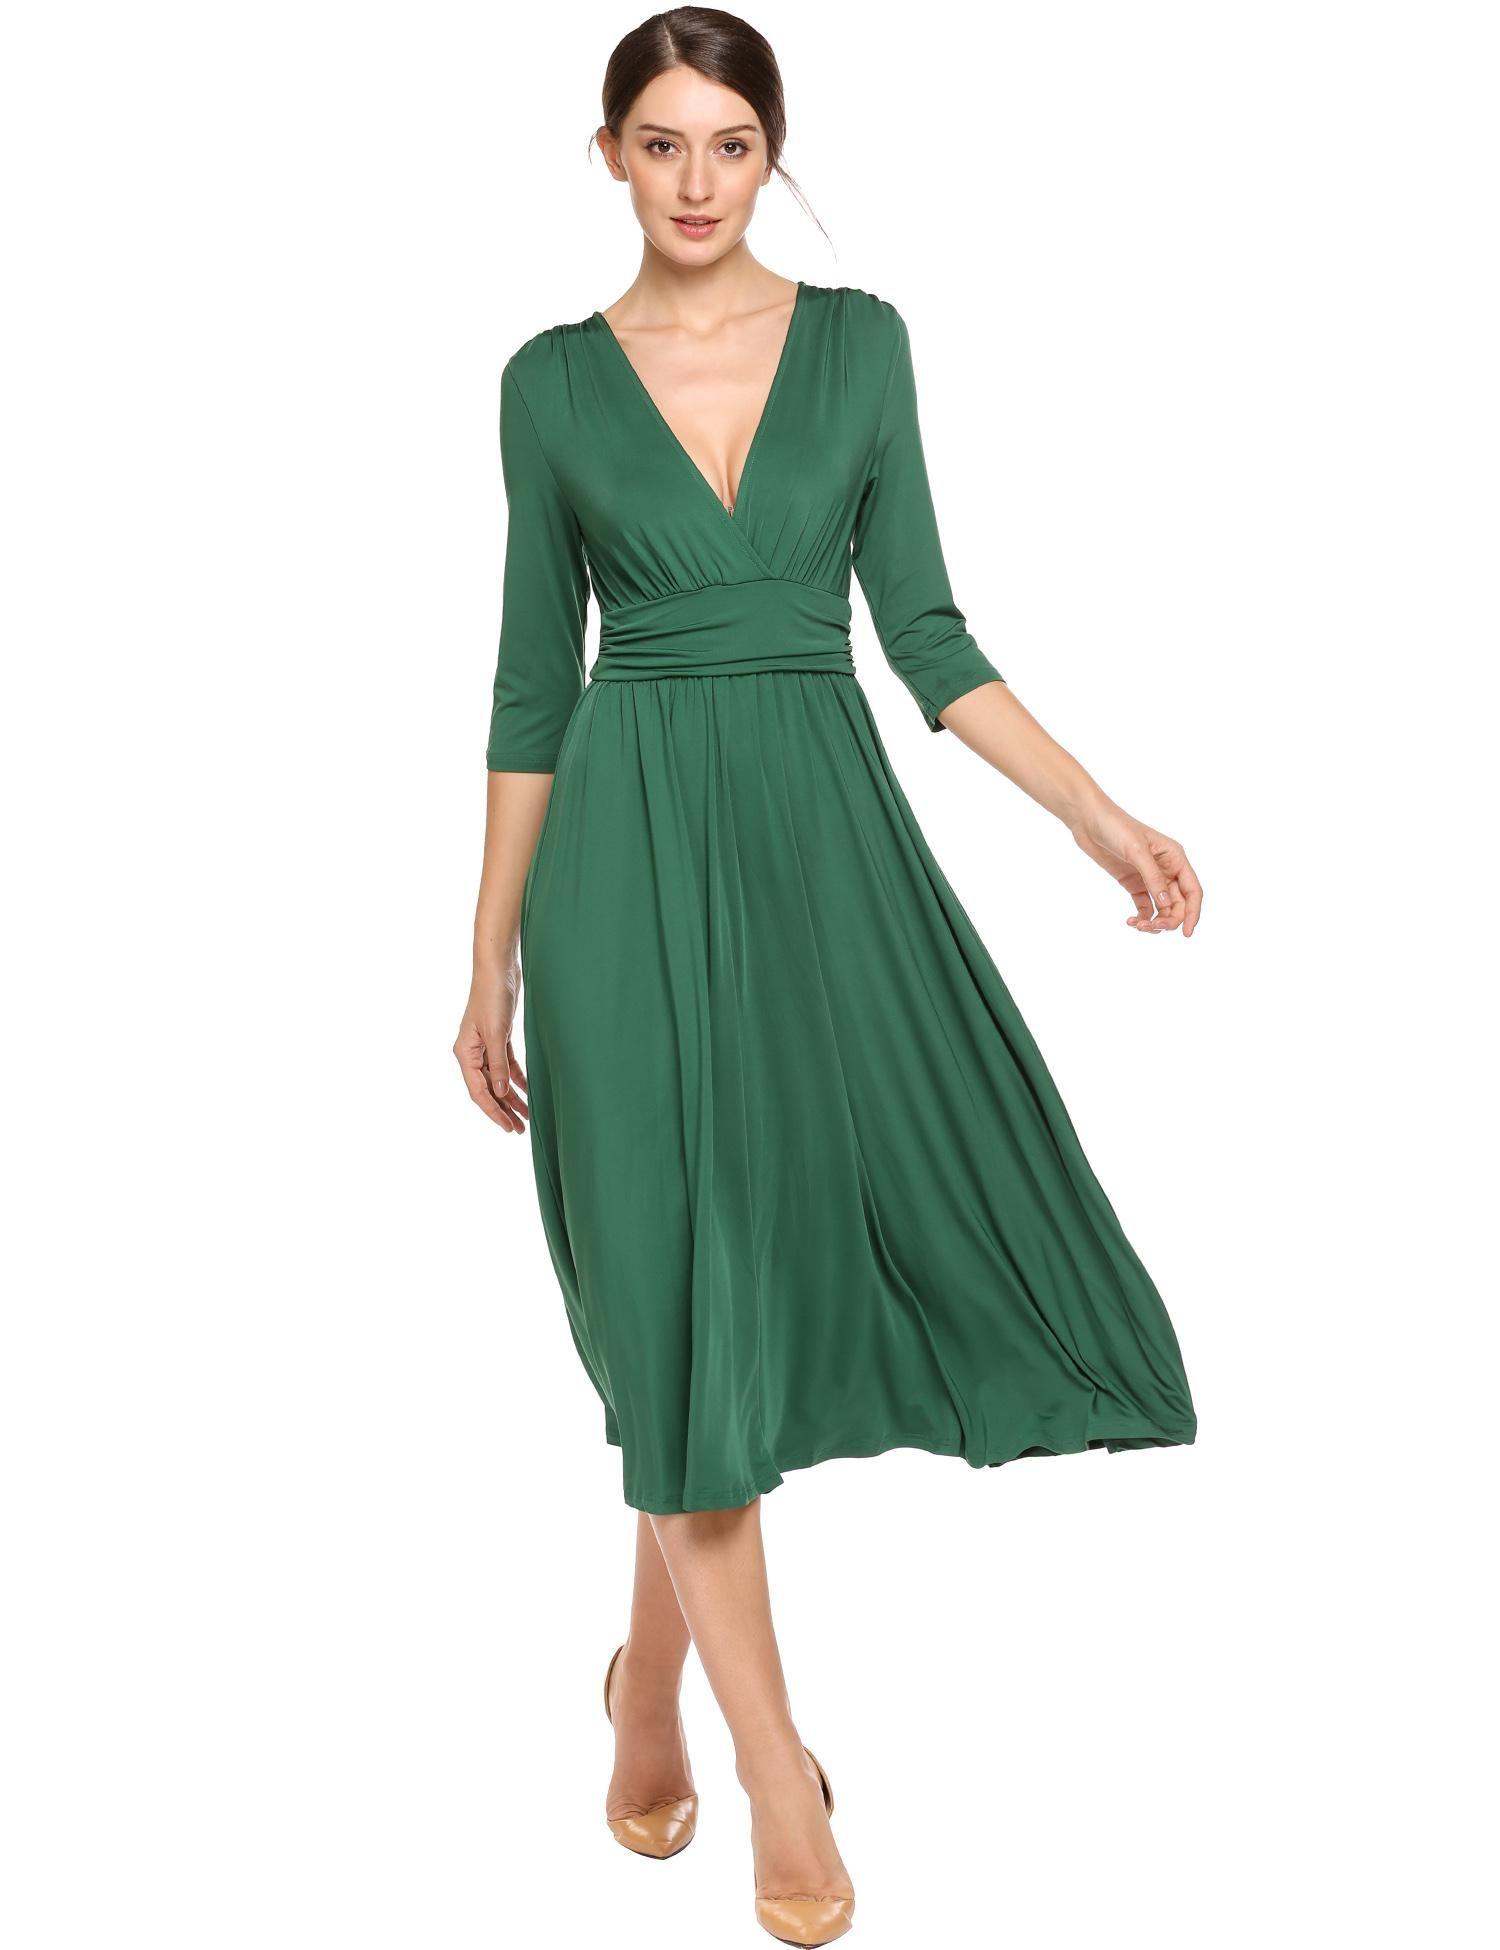 Dark Green V Neck 3 4 Sleeve Ruched Waist Solid Casual Midi Dress Dresslink Com Midi Dress Casual Dress Link Dresses [ 1950 x 1500 Pixel ]